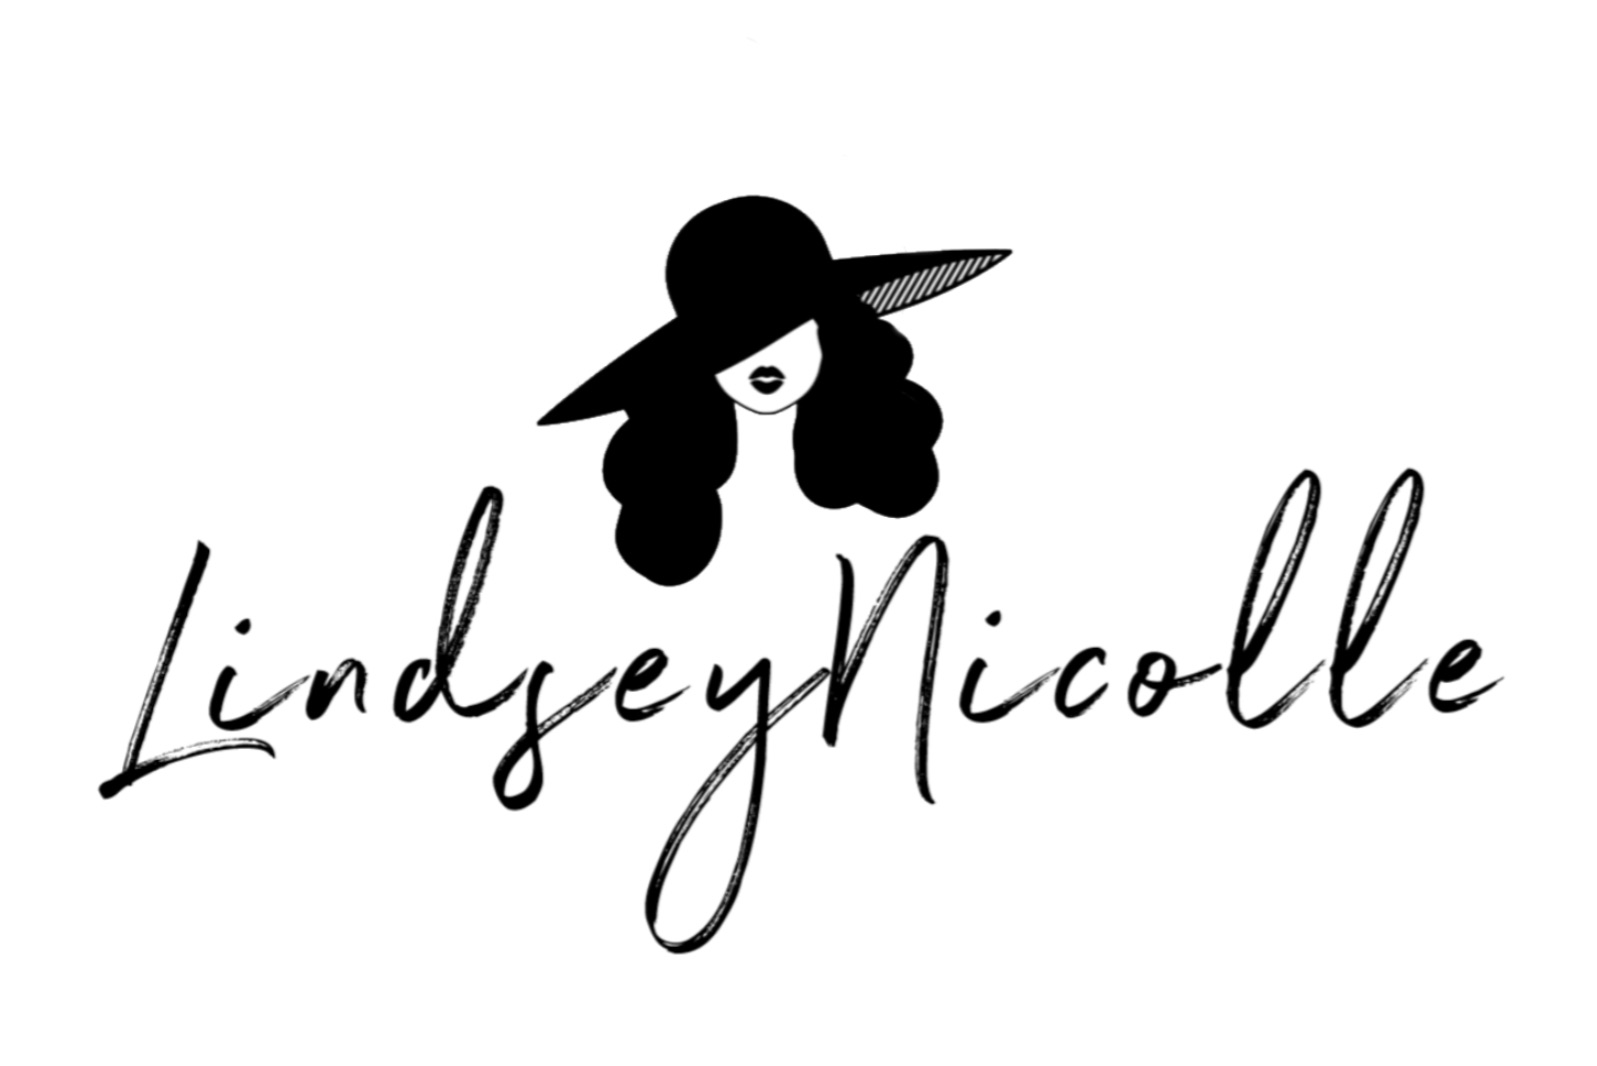 Lindsey Nicolle.com LLC